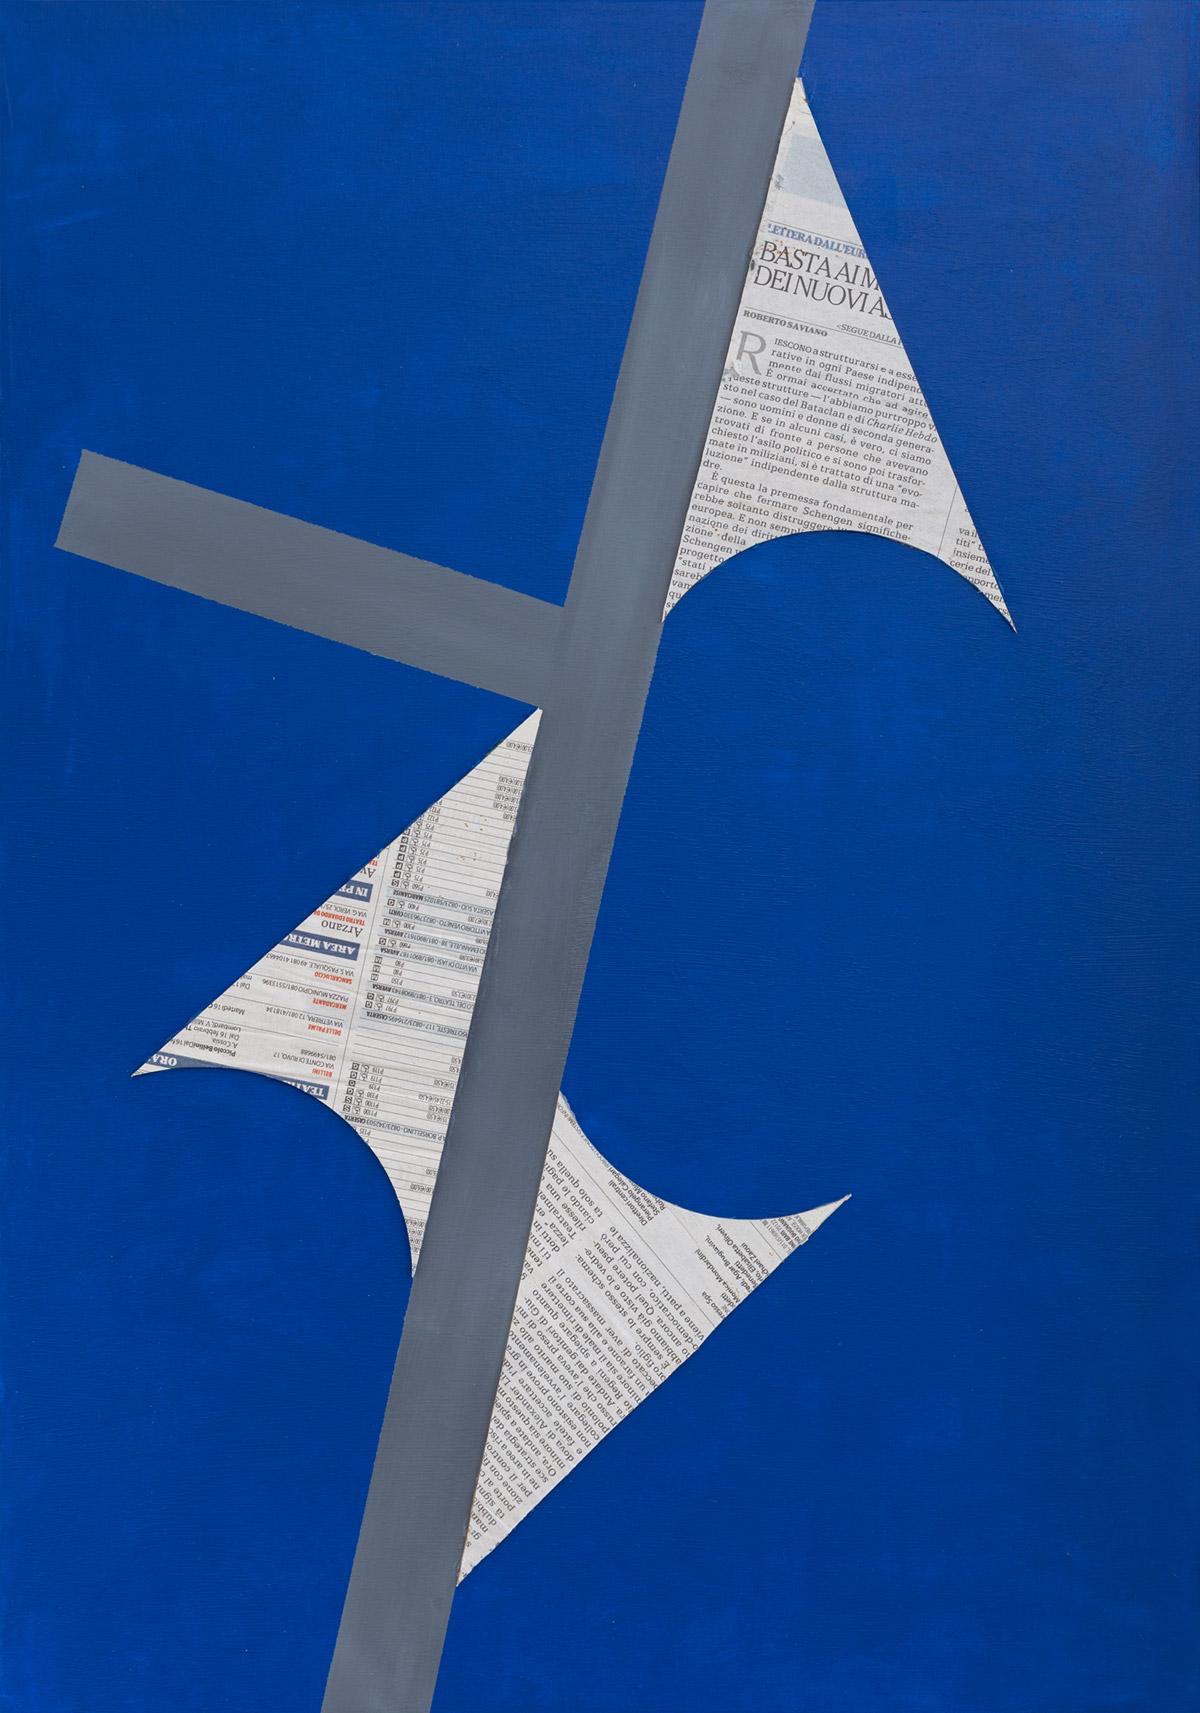 linearismi-quotidiani-in-blu